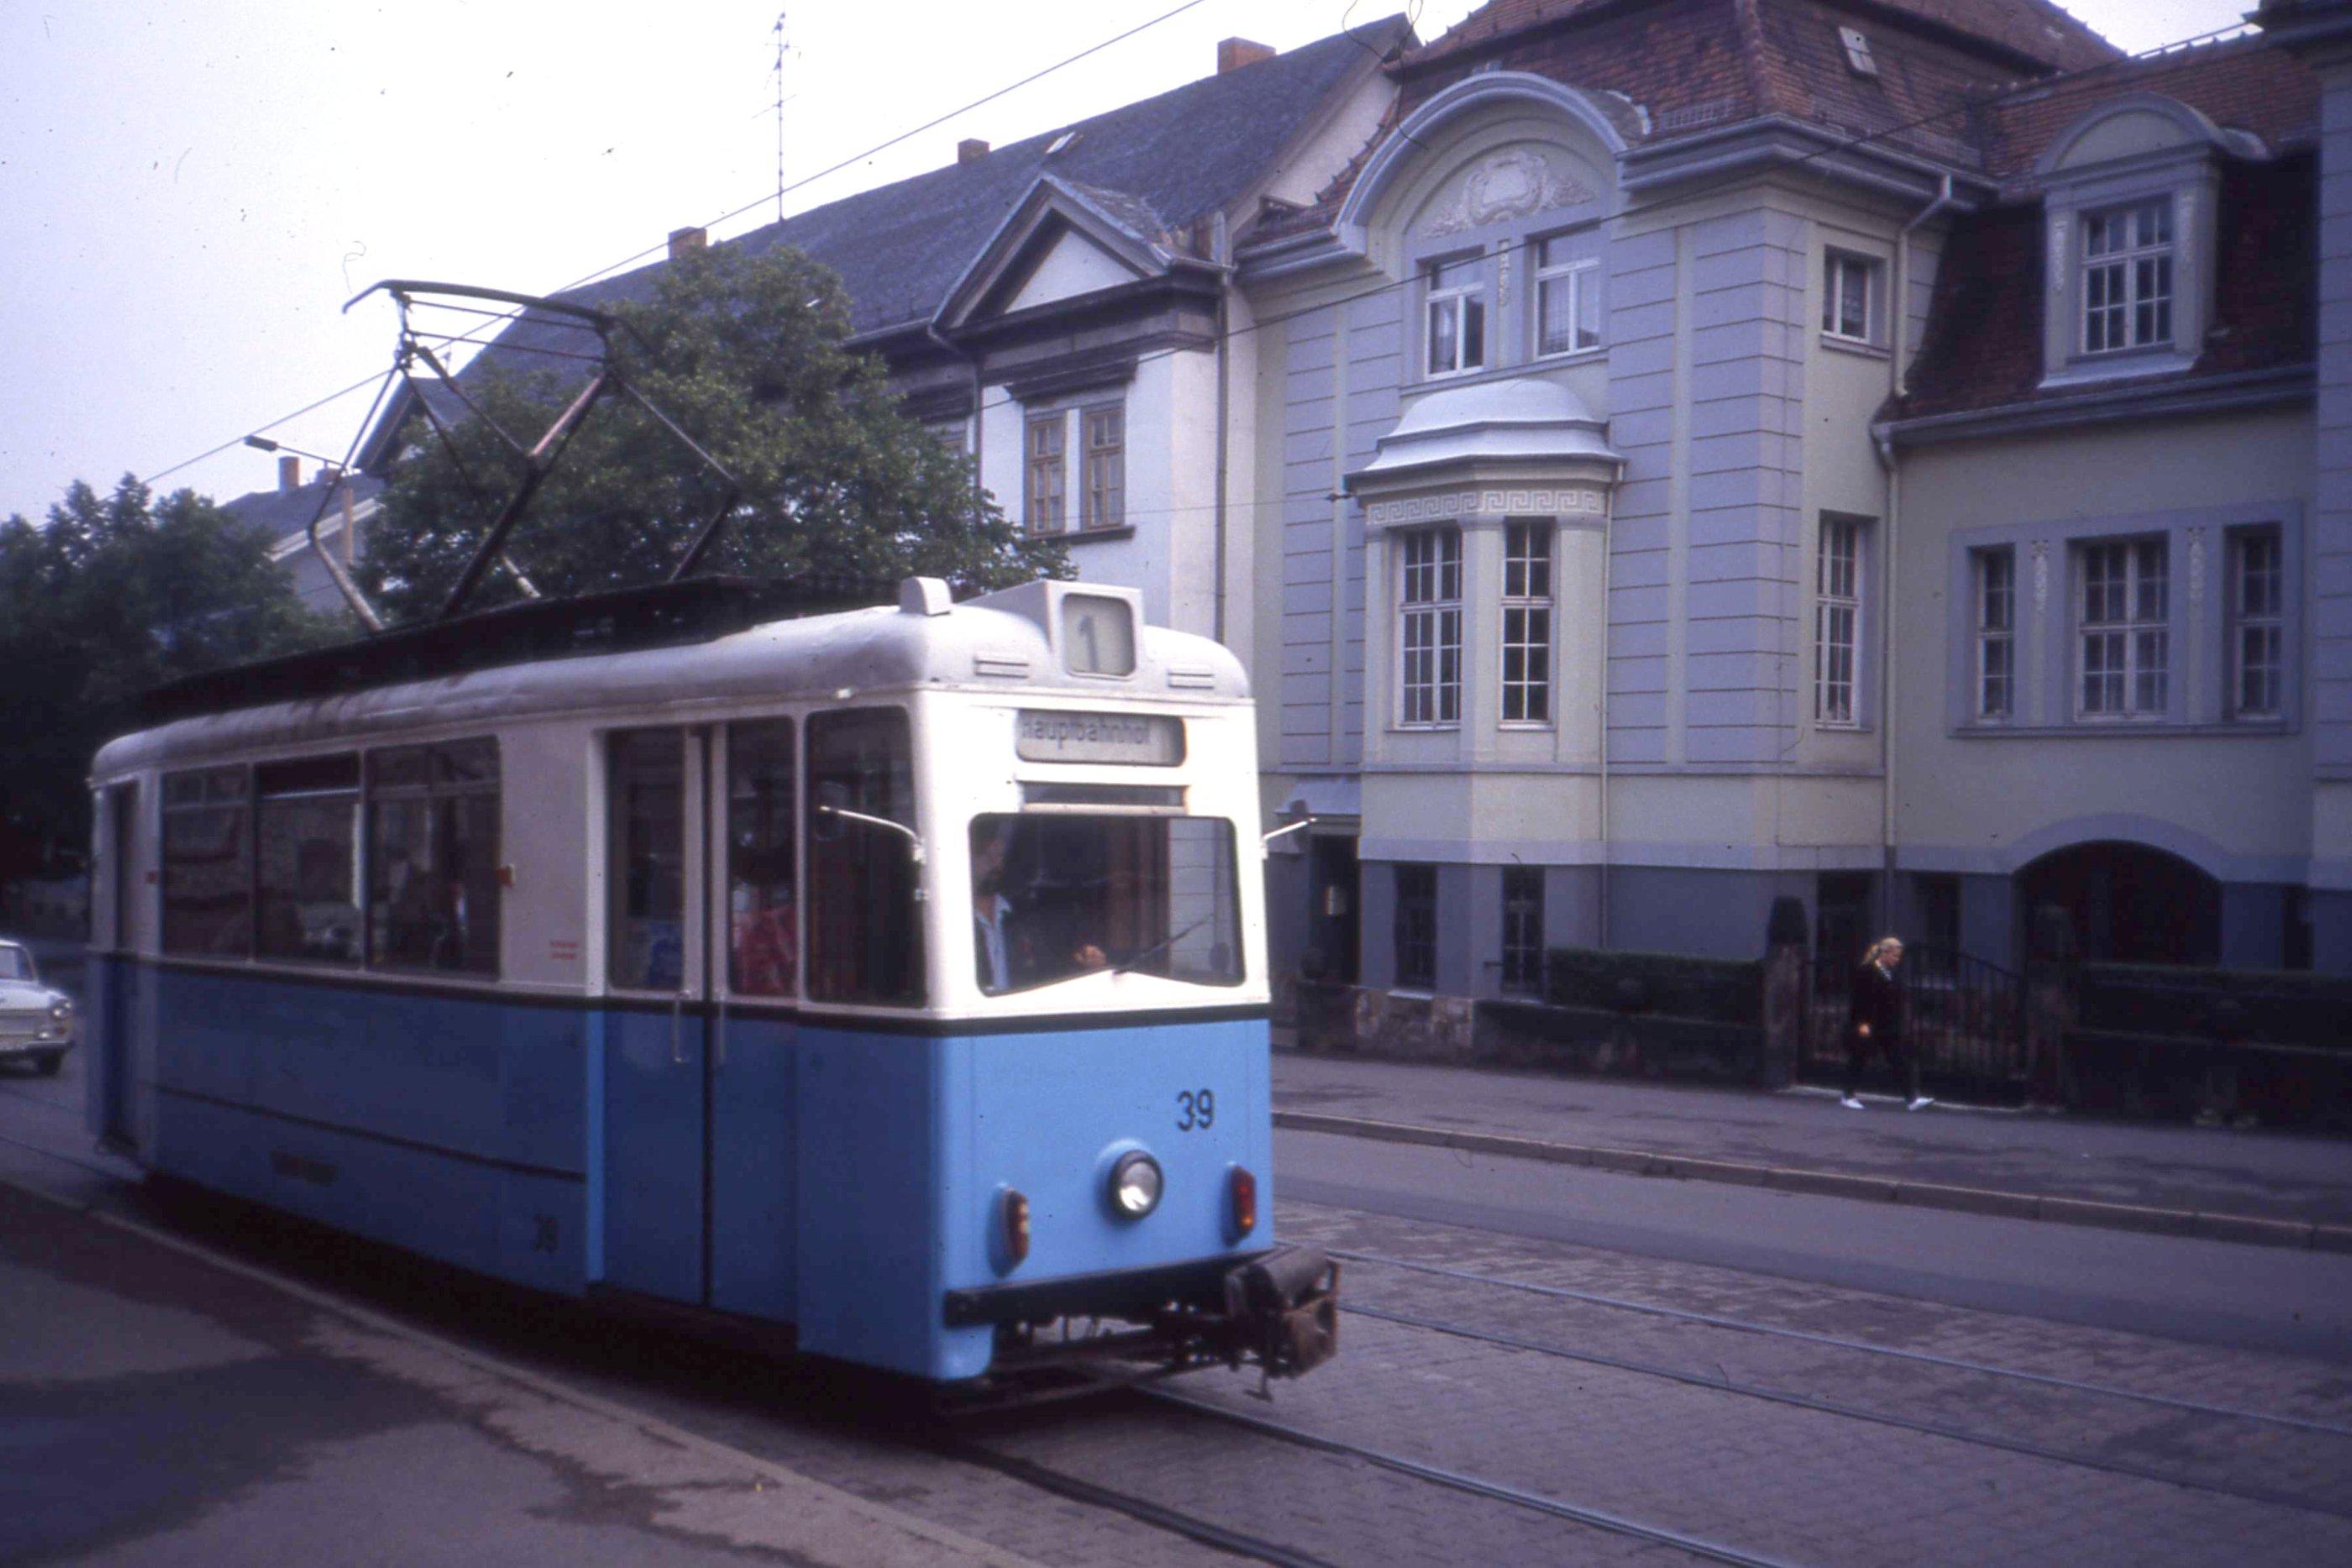 Straßenbahn Gotha Aug 1991. Gotha ET55 Triebwagen nr 39, Linie 1, Bahnhofstraße Gotha Germany. - Flickr - sludgegulper.jpg